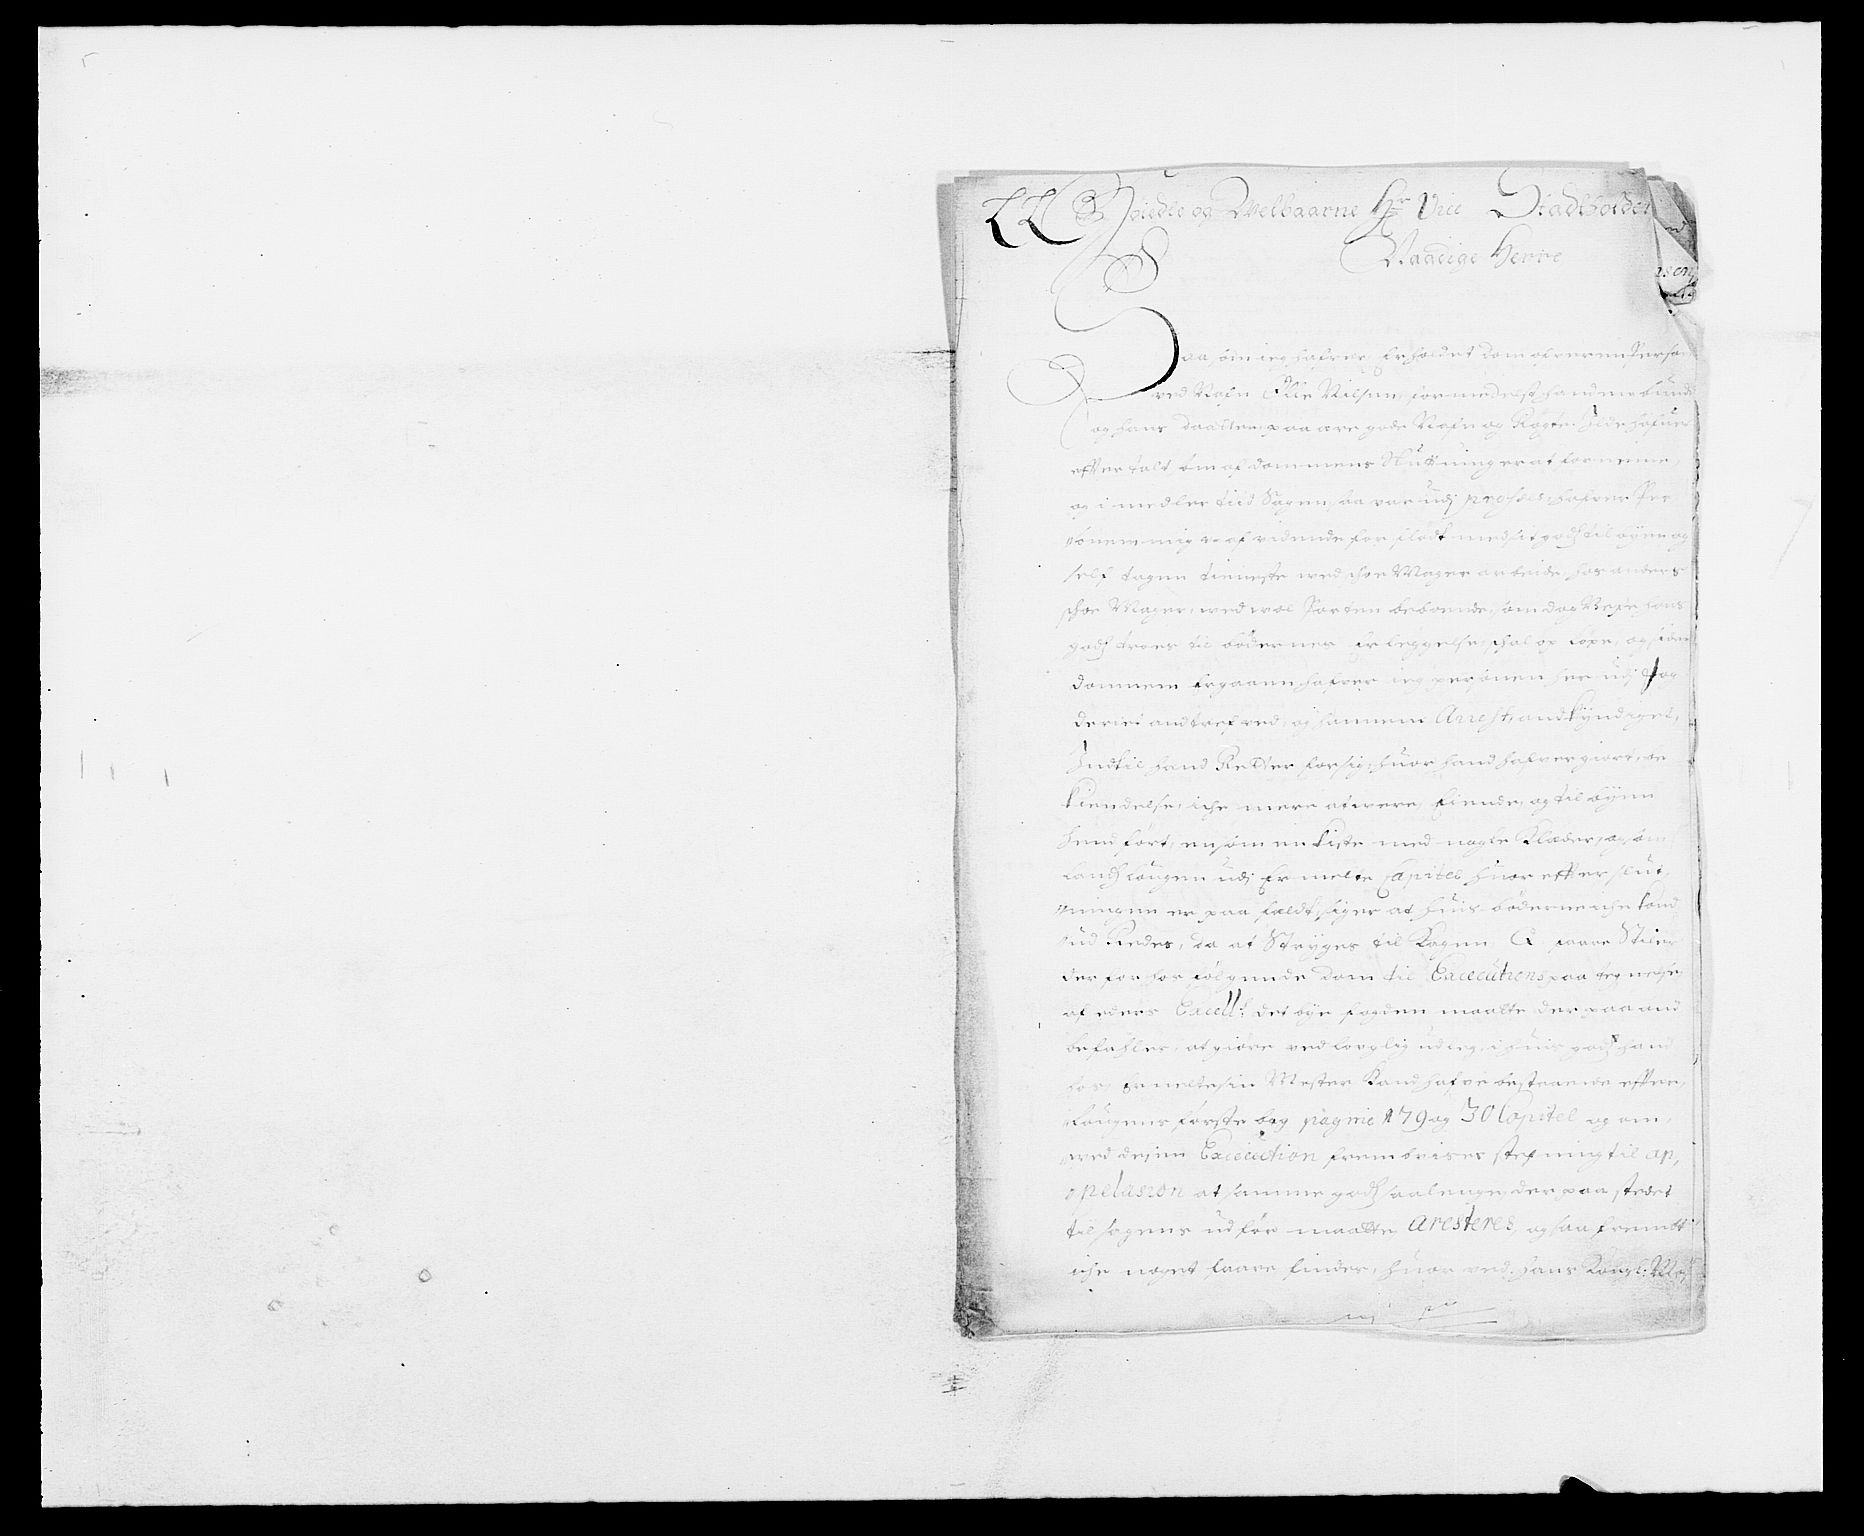 RA, Rentekammeret inntil 1814, Reviderte regnskaper, Fogderegnskap, R09/L0435: Fogderegnskap Follo, 1689-1691, s. 17